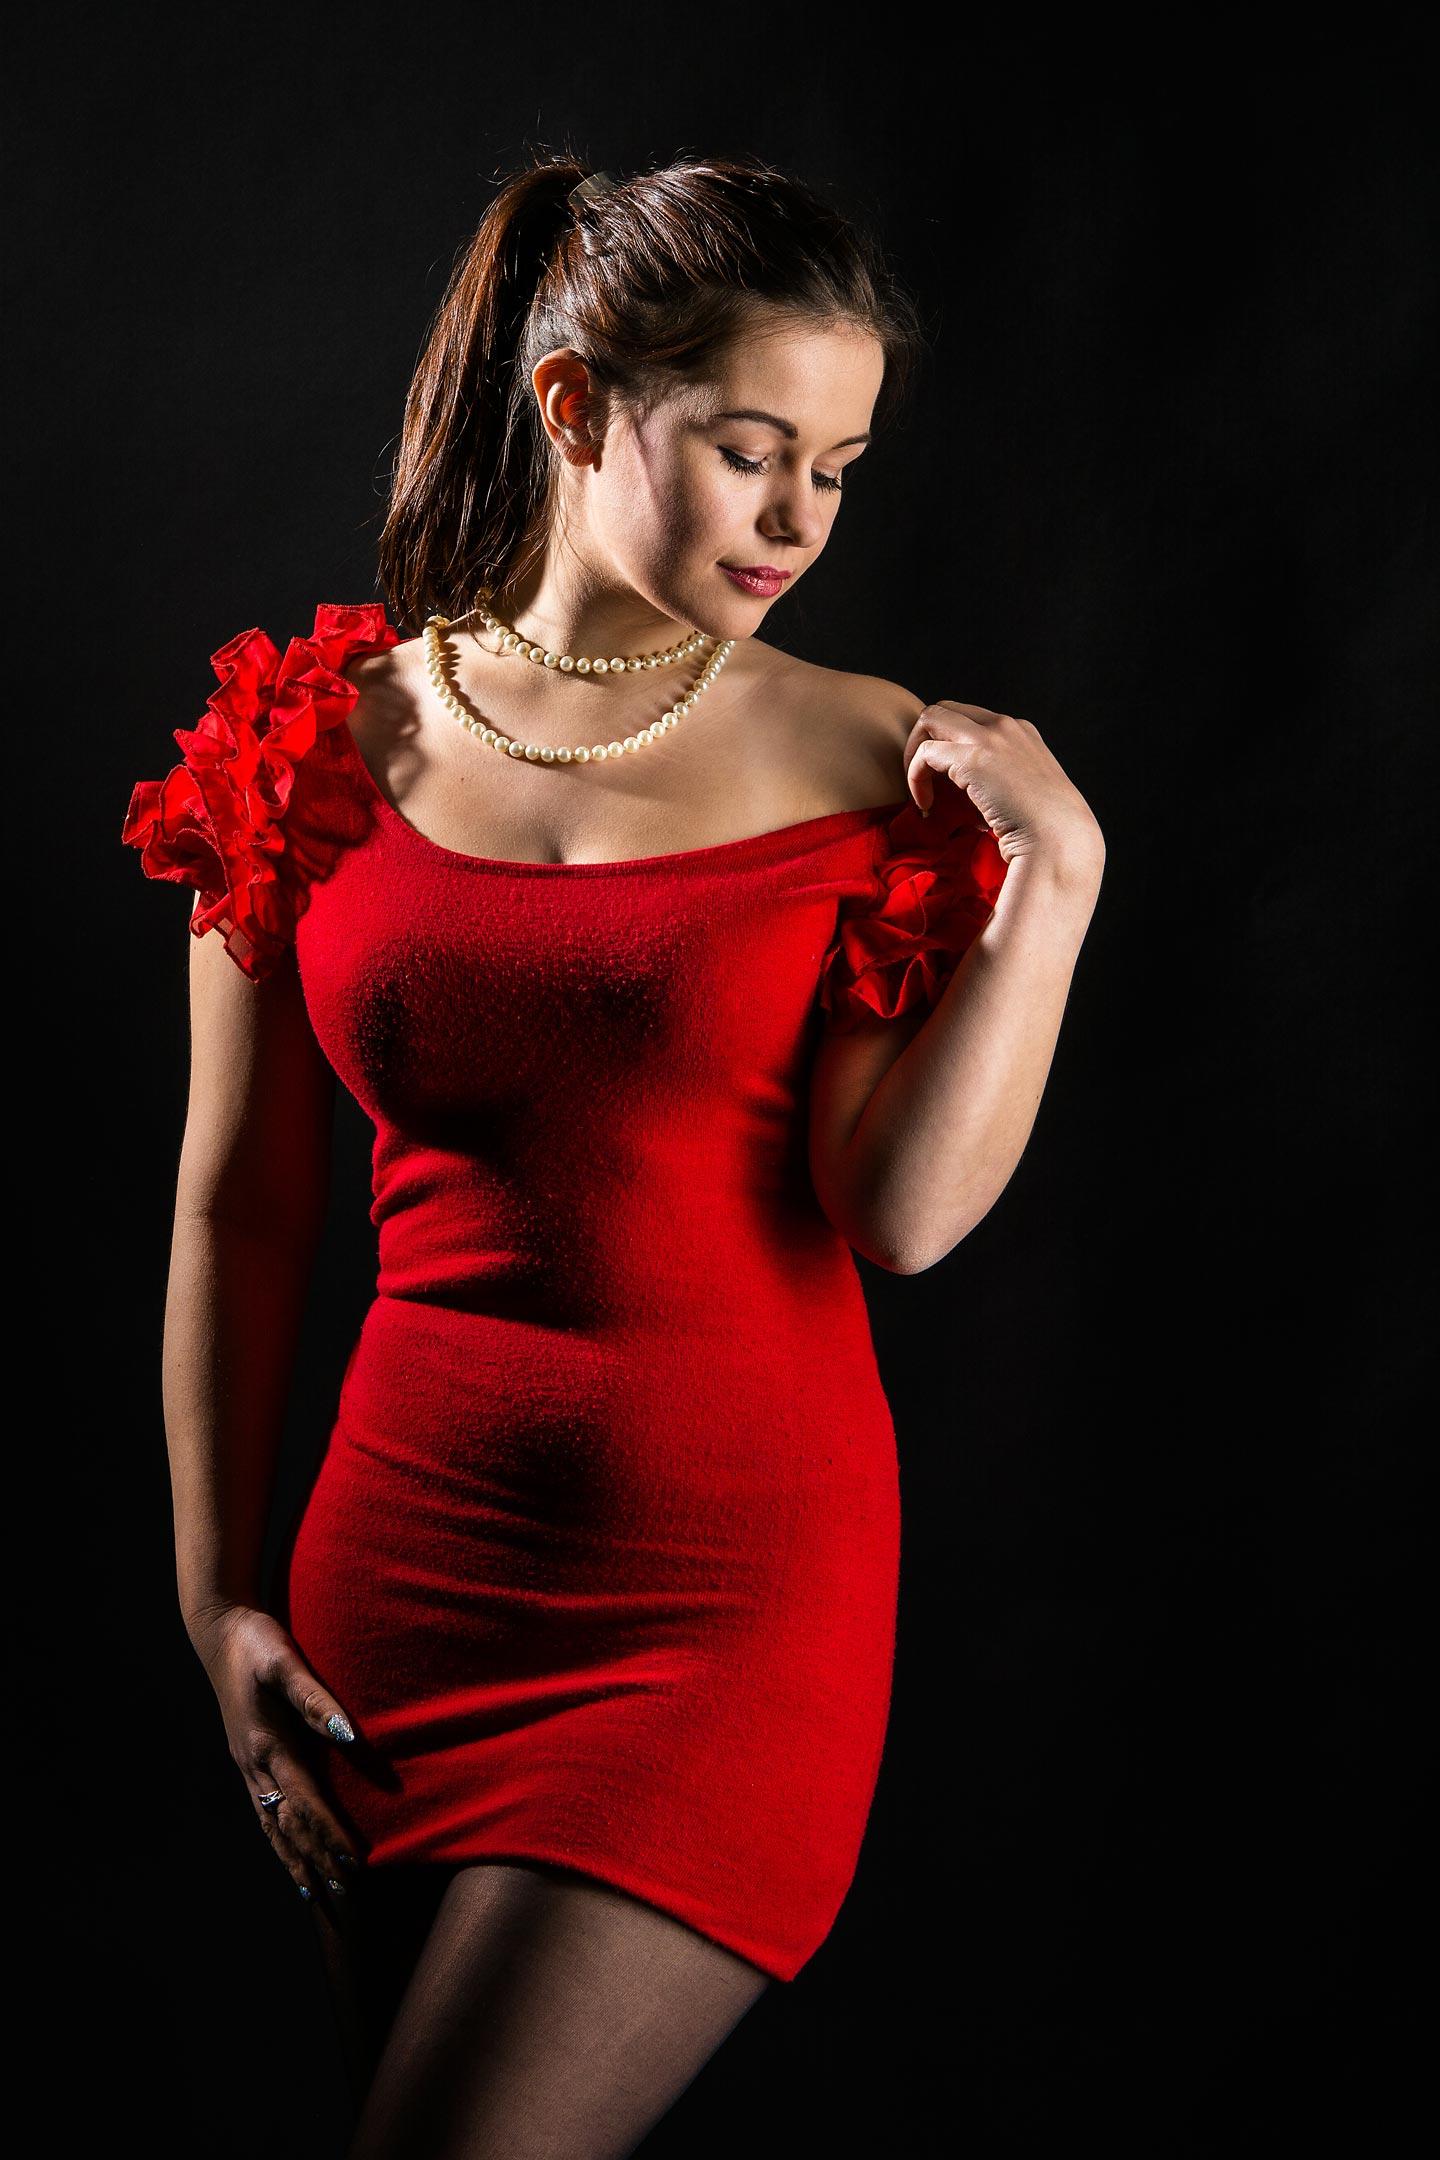 junge Frau im roten Kleid Fotoedmundo